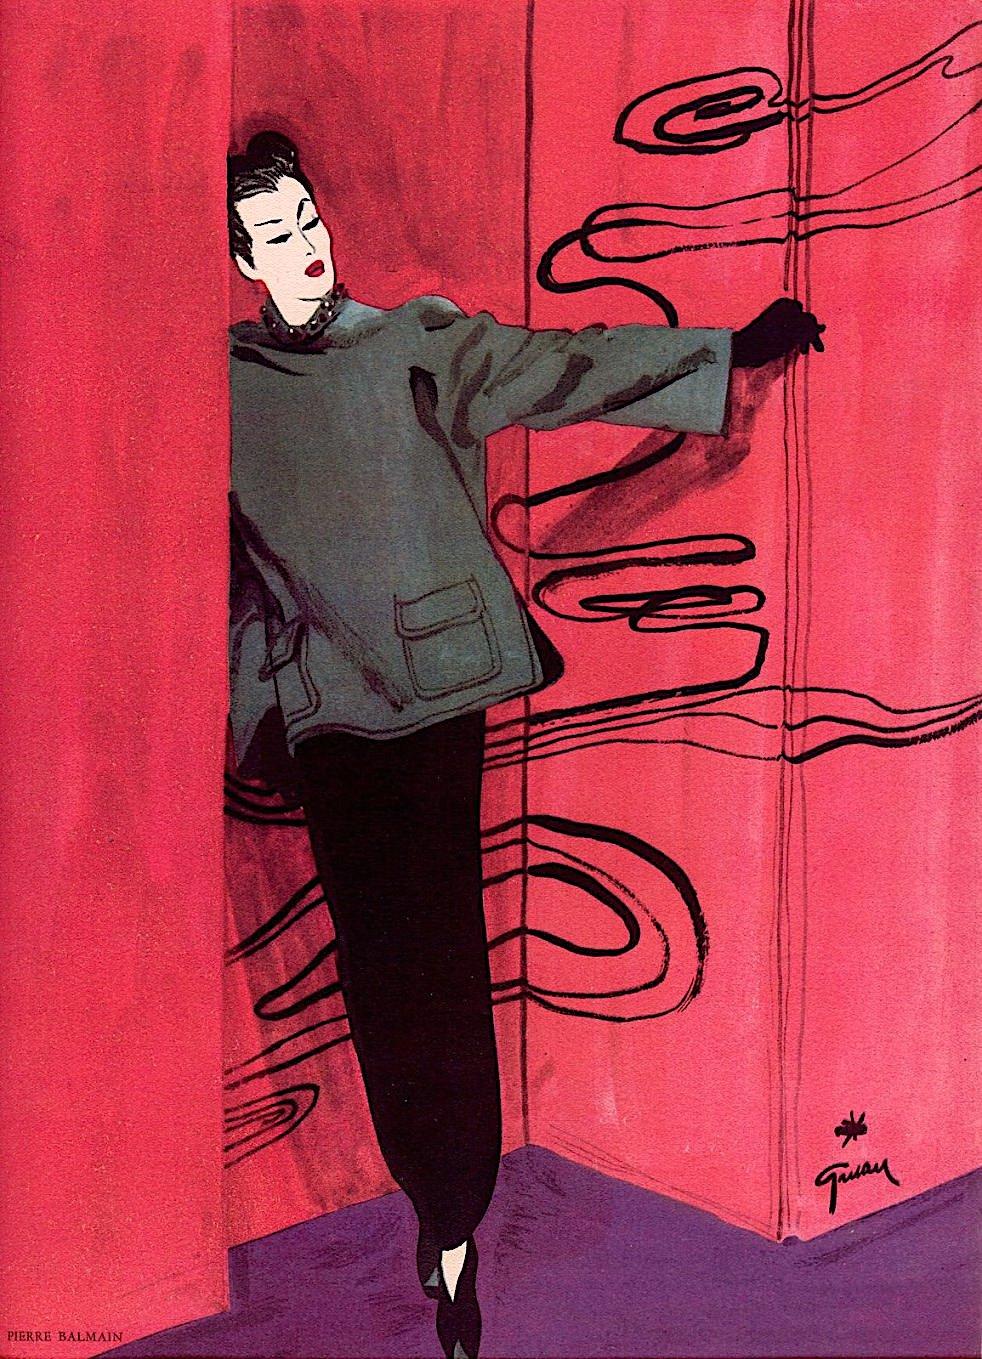 a René Gruau fashion illustration